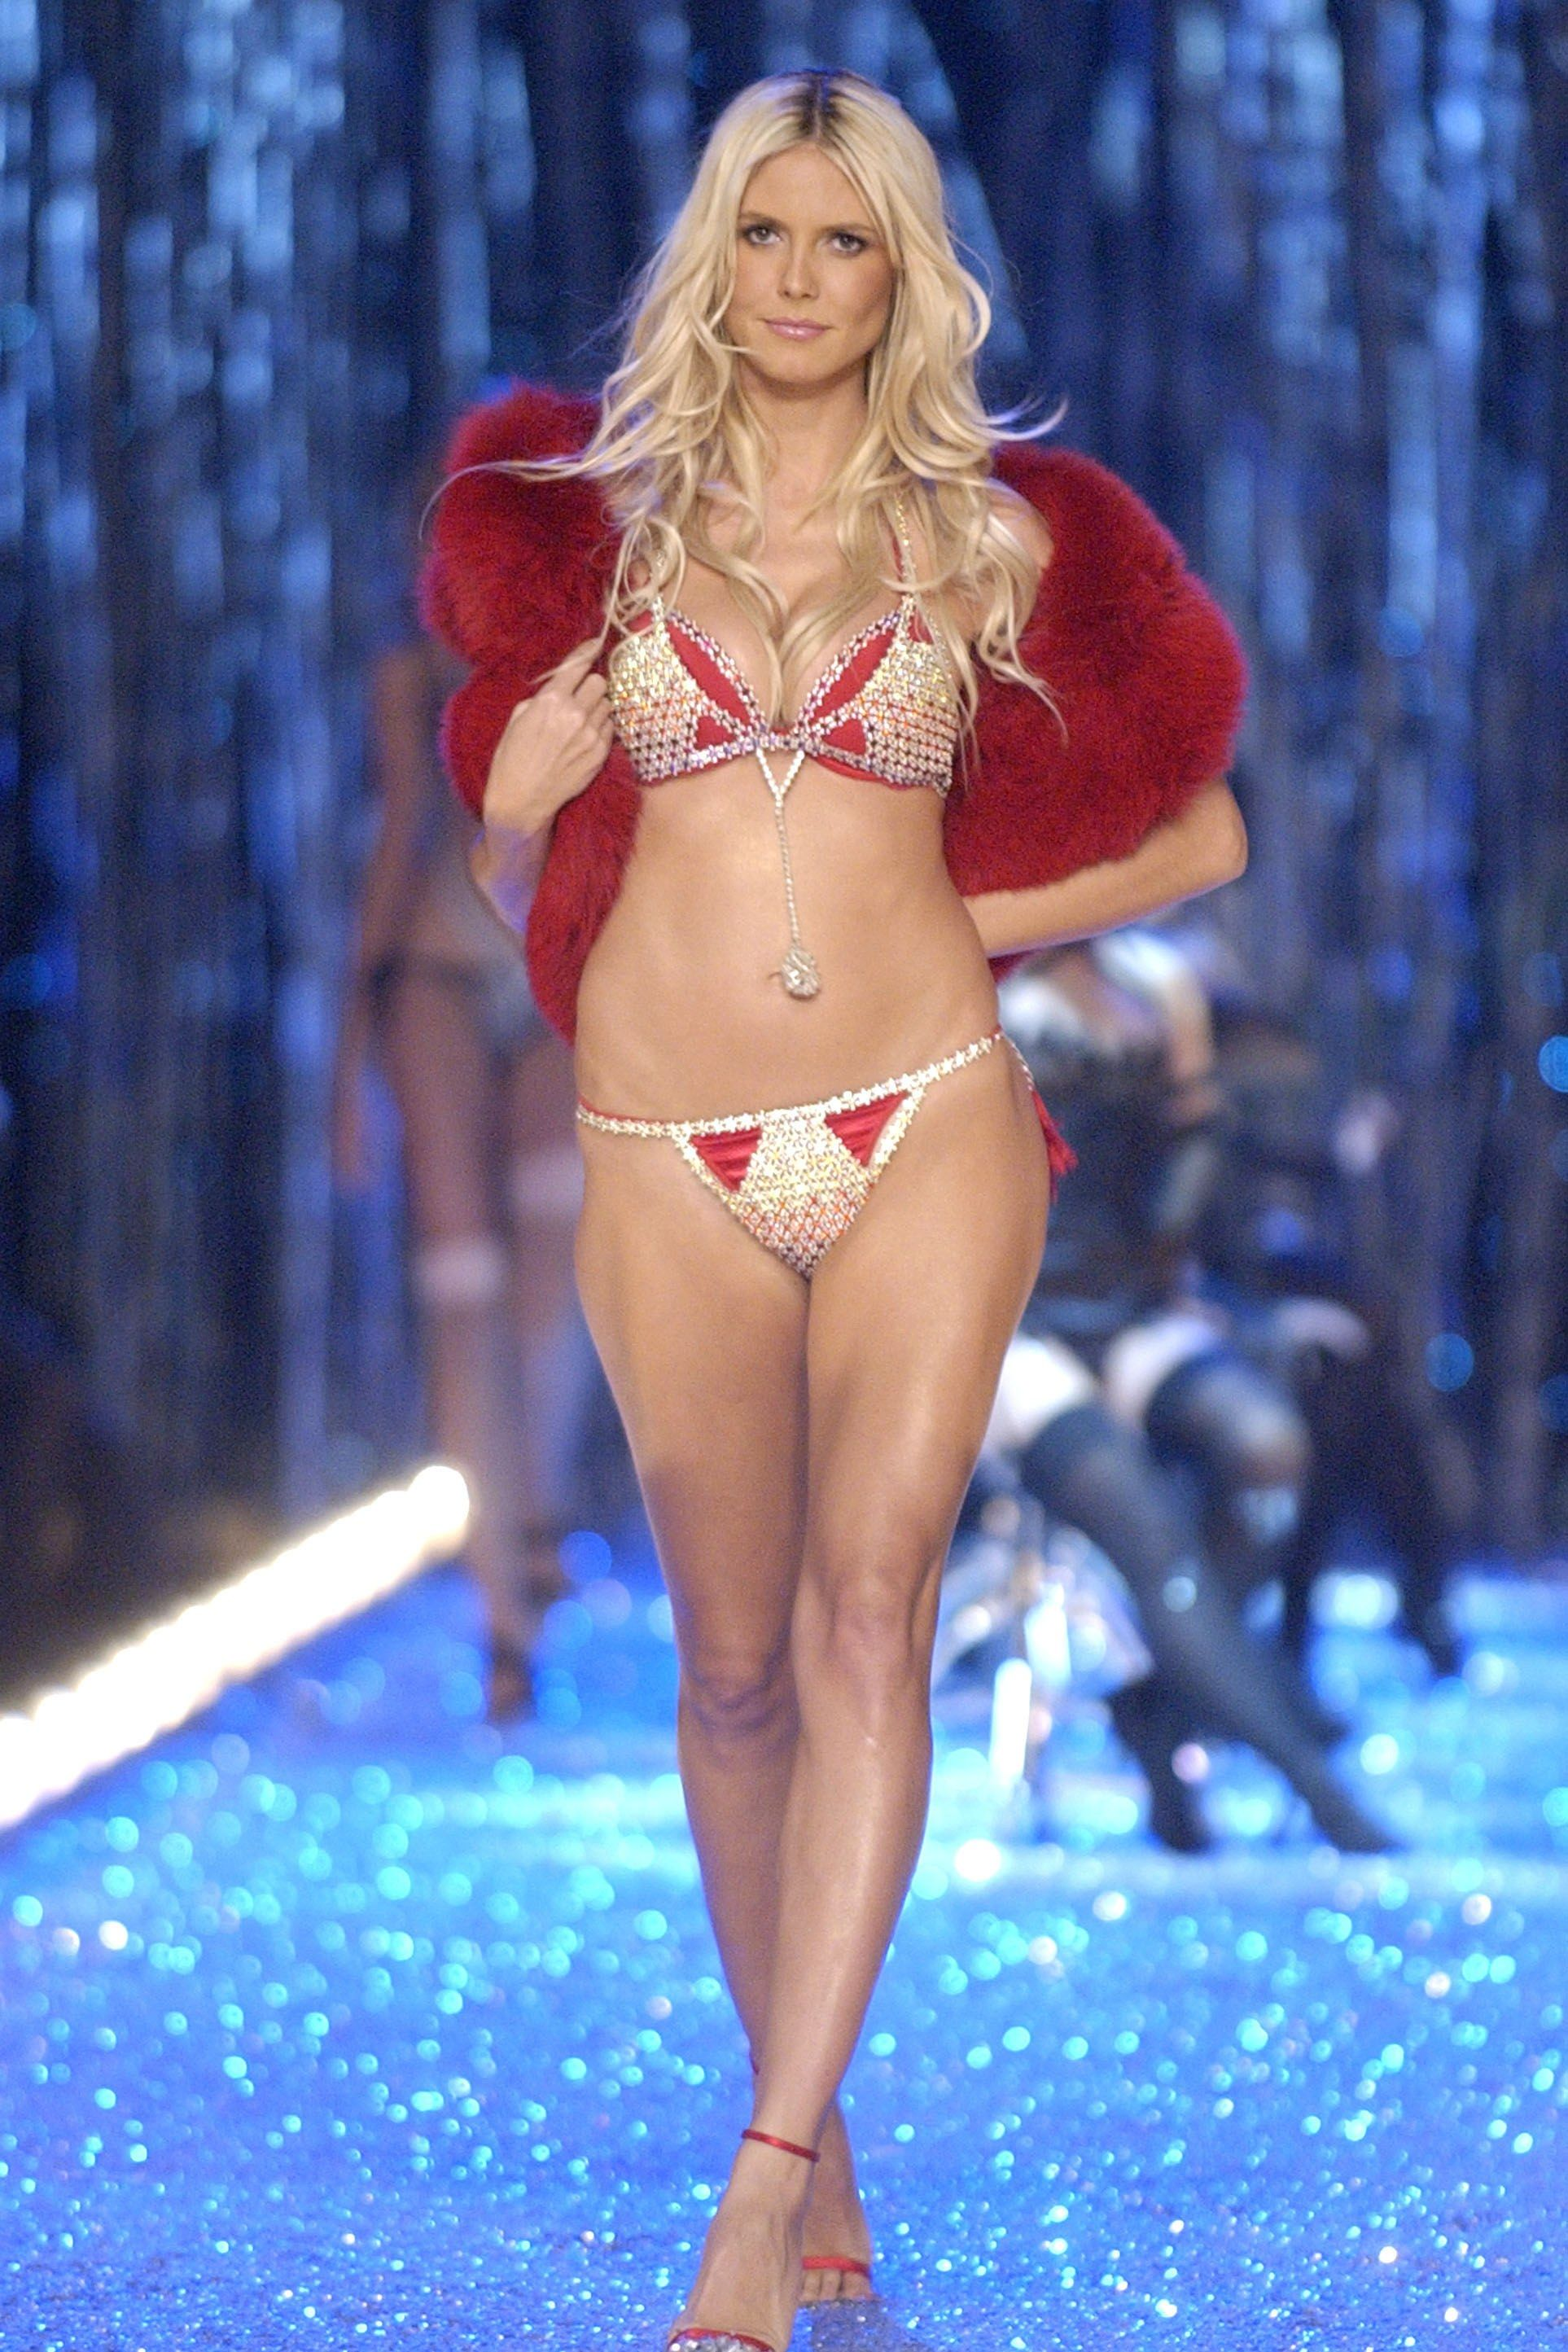 Resultado de imagen para Heidi Klum Very Sexy Fantasy Bra